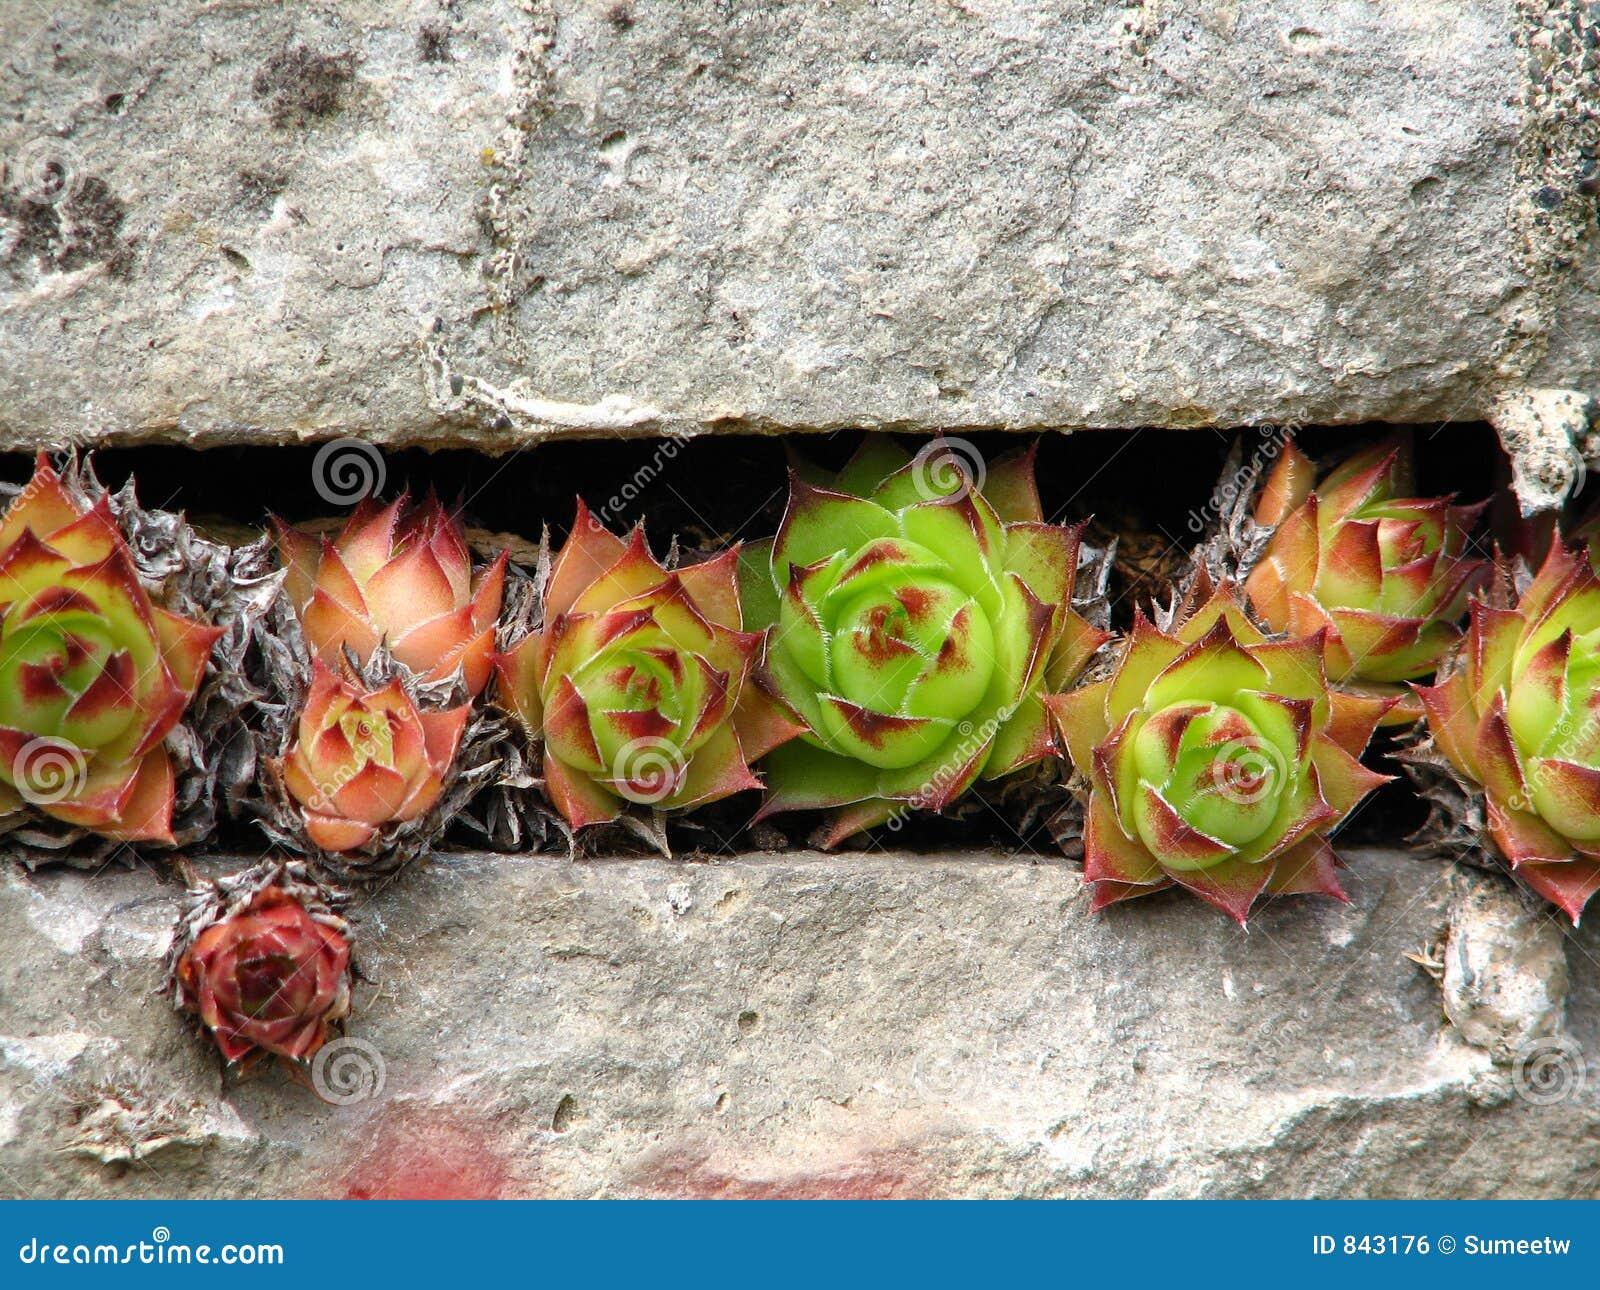 spiral cactus growth